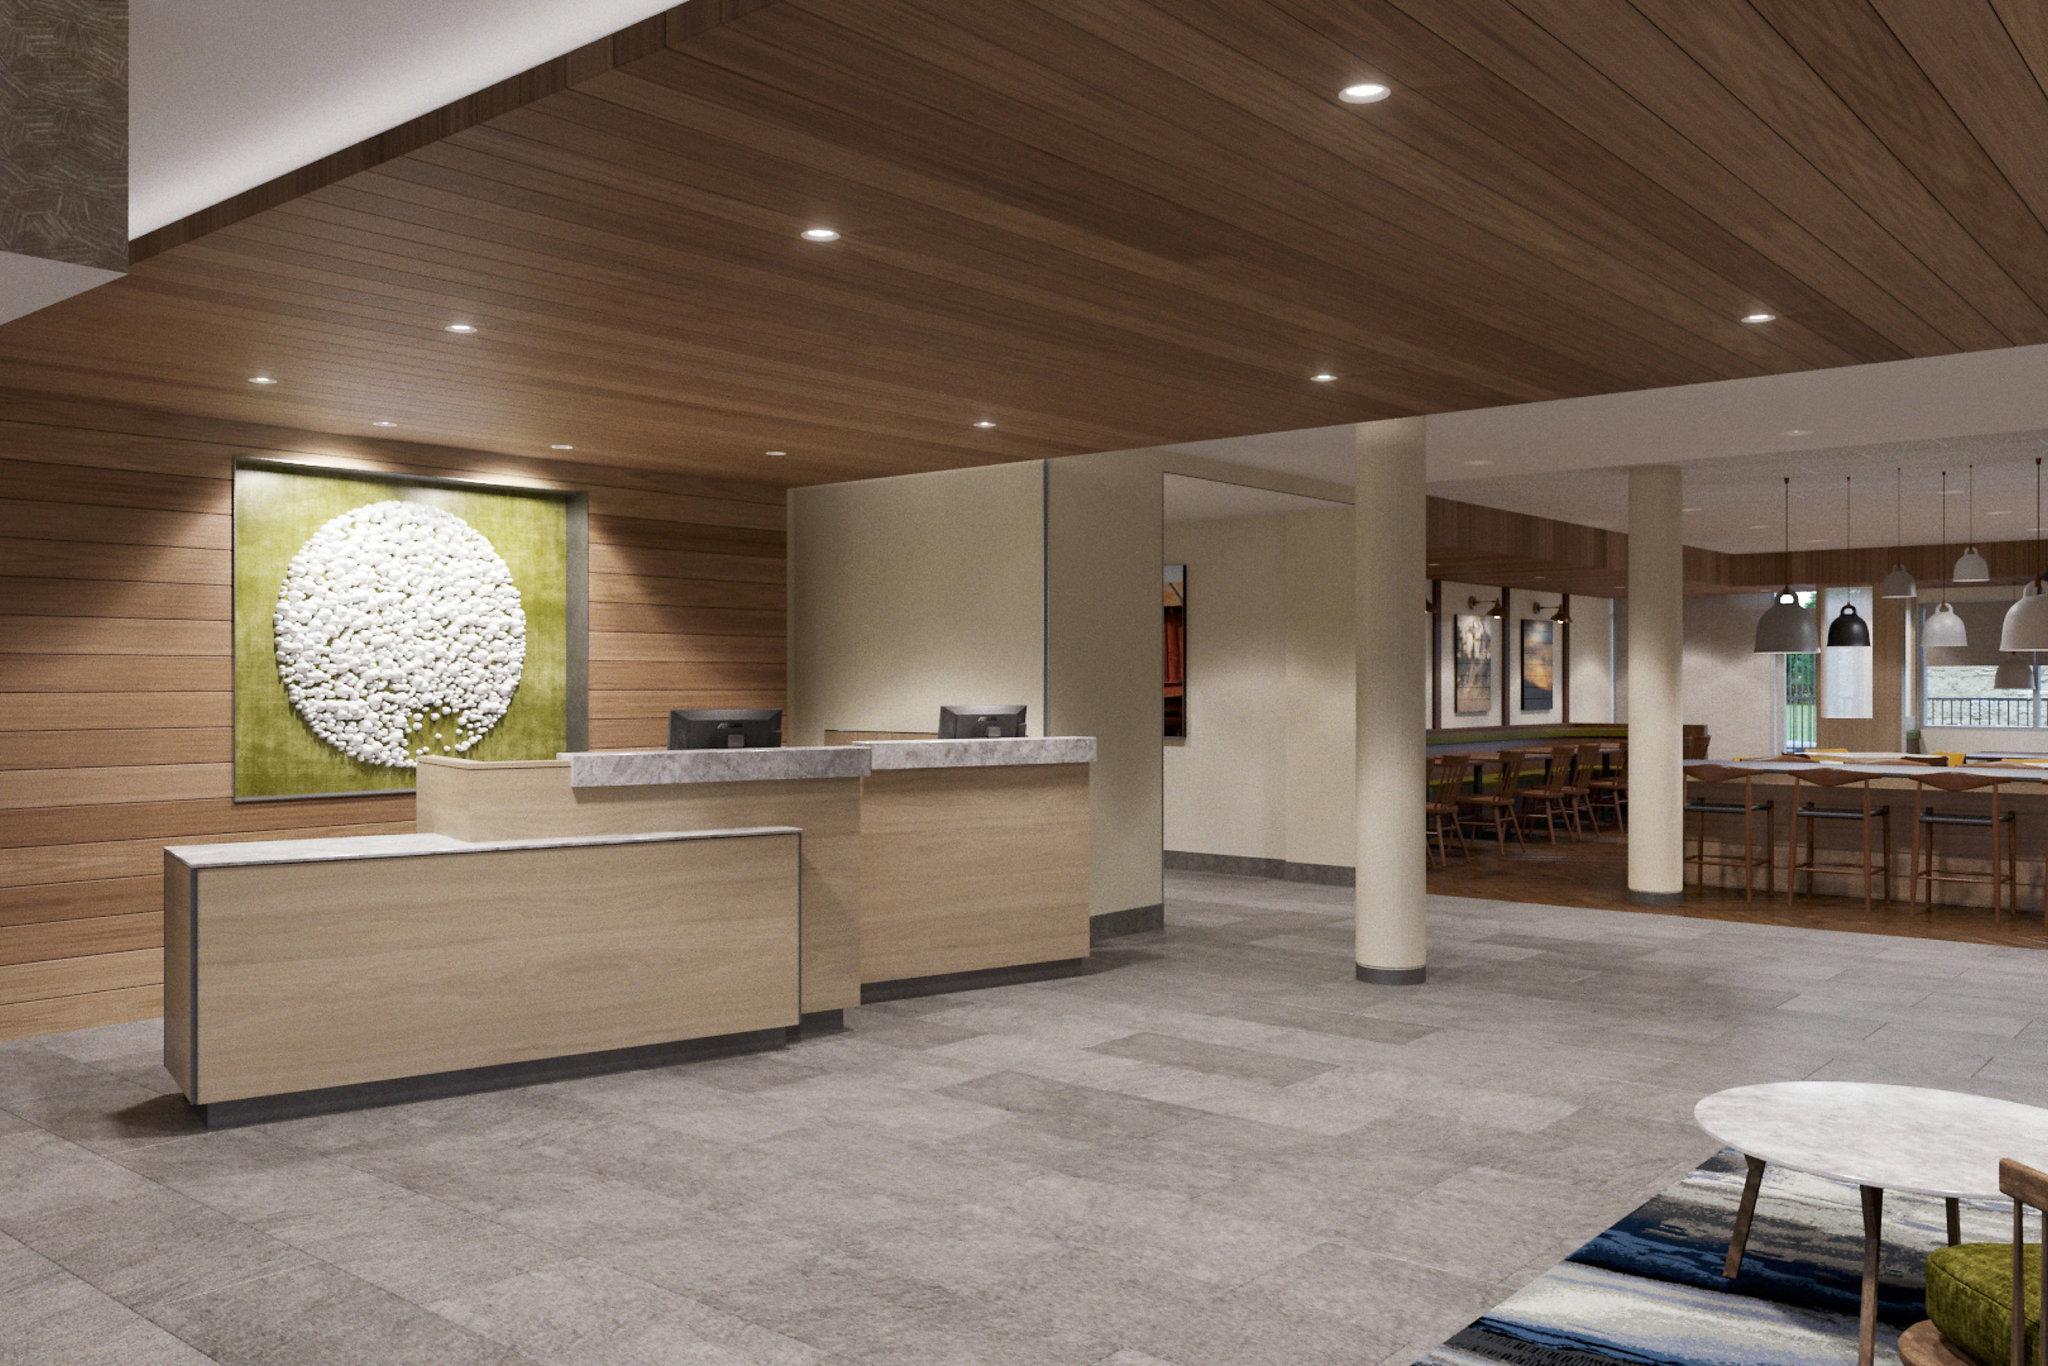 Fairfield Inn And Suites Richmond Airport